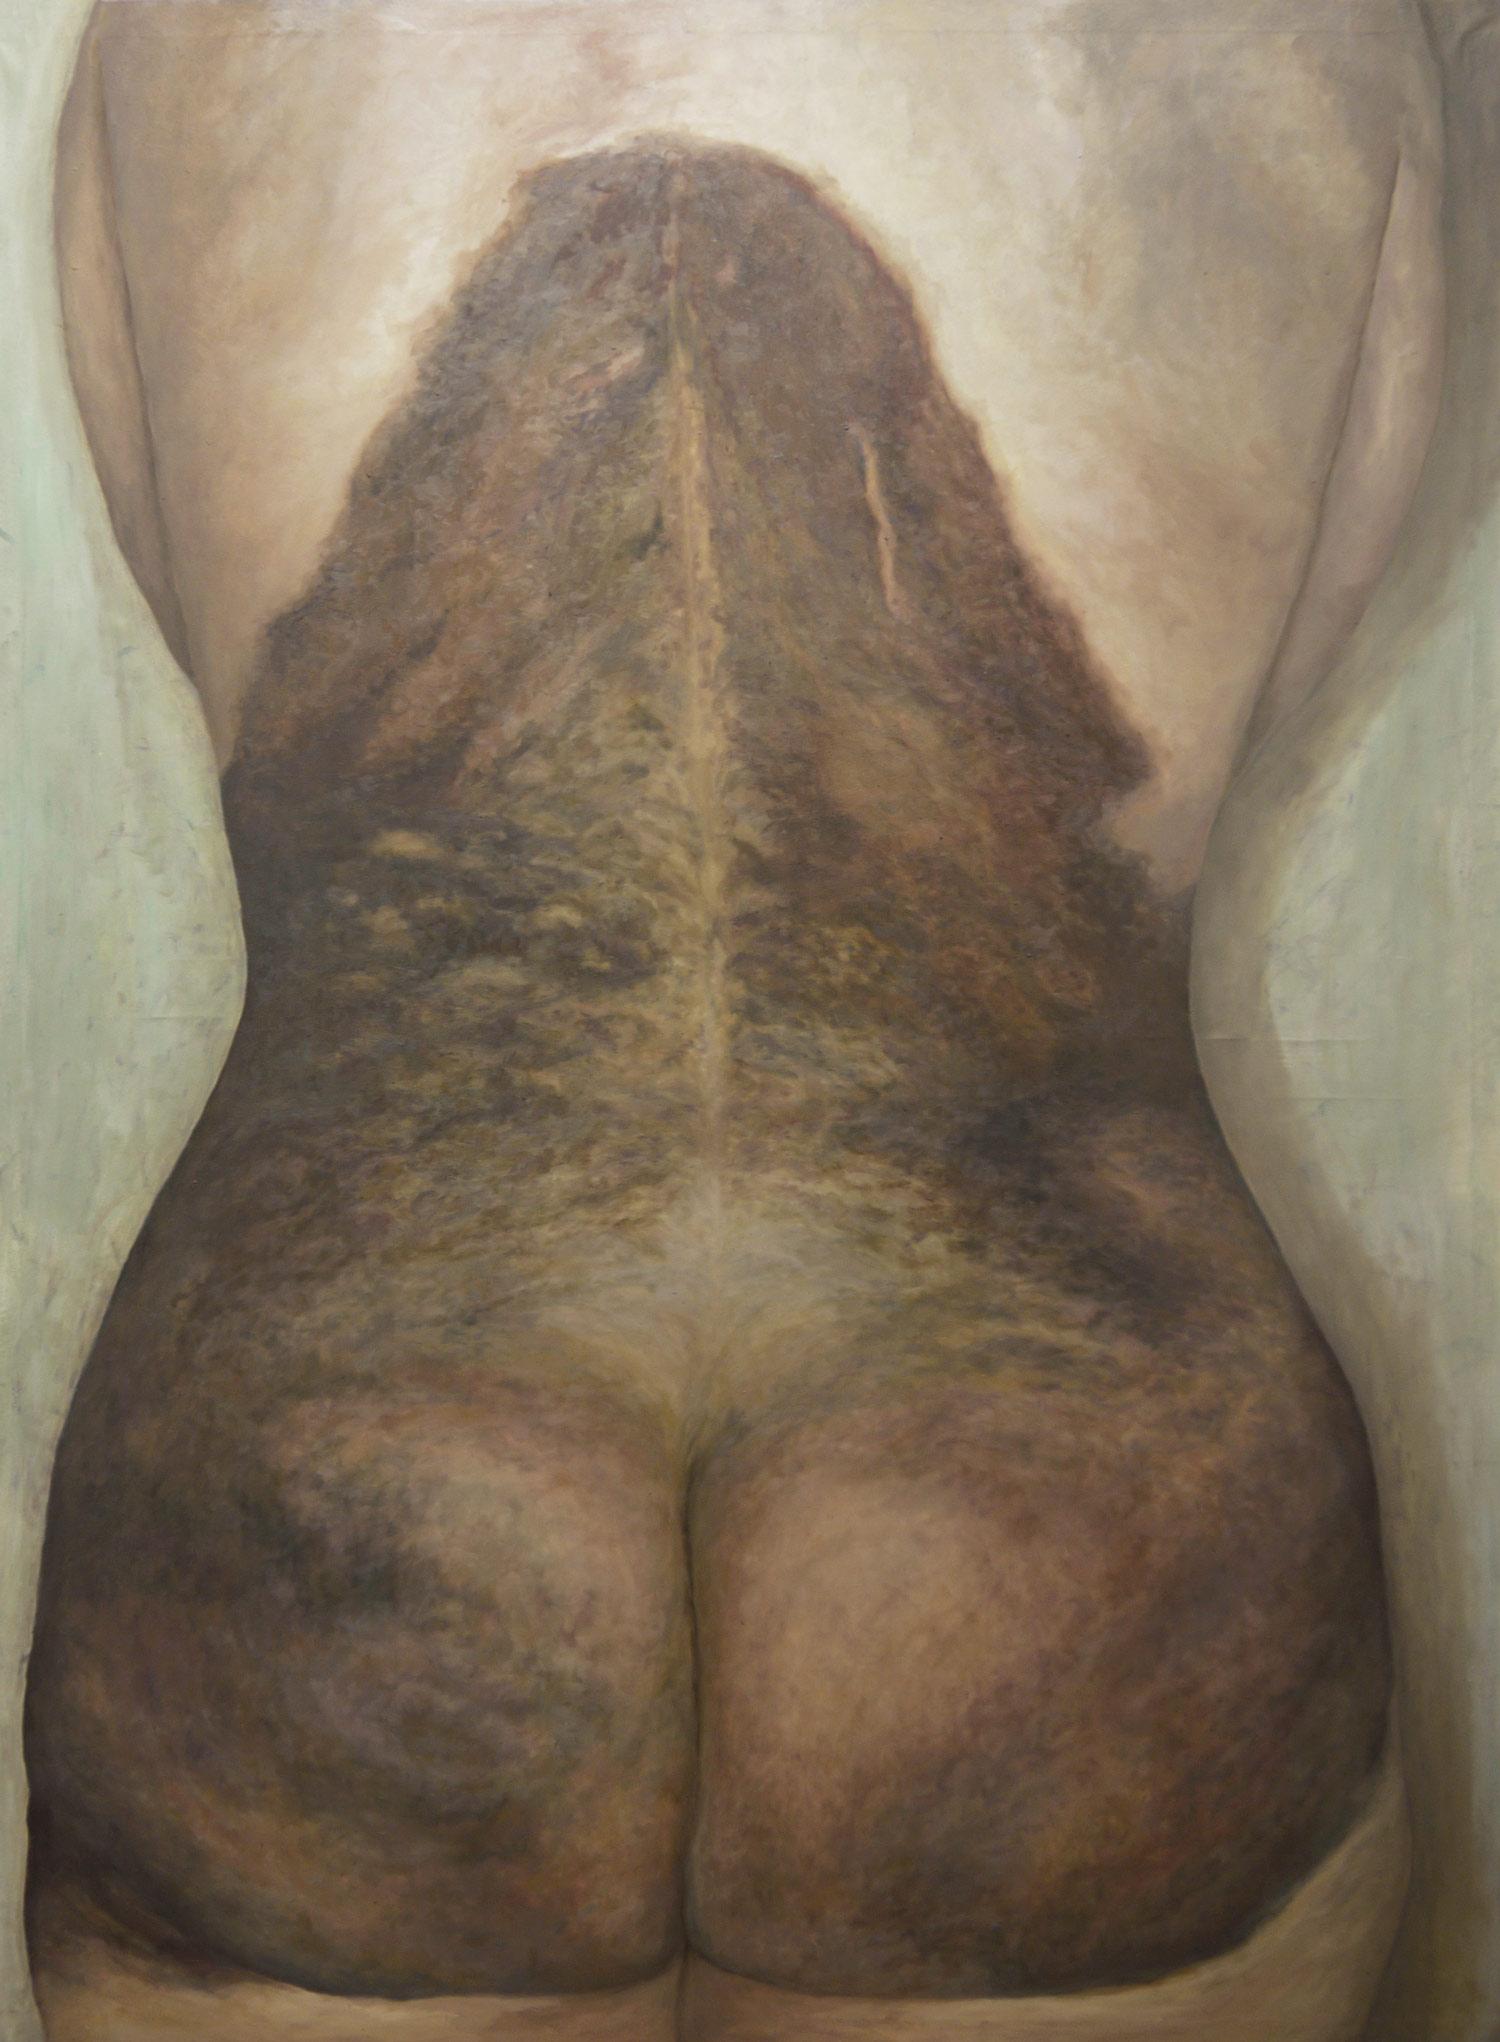 Laura Link . Neavus Flammerus Gigantus 2 . 2014 . Öl auf Leinwand . 170 x 120